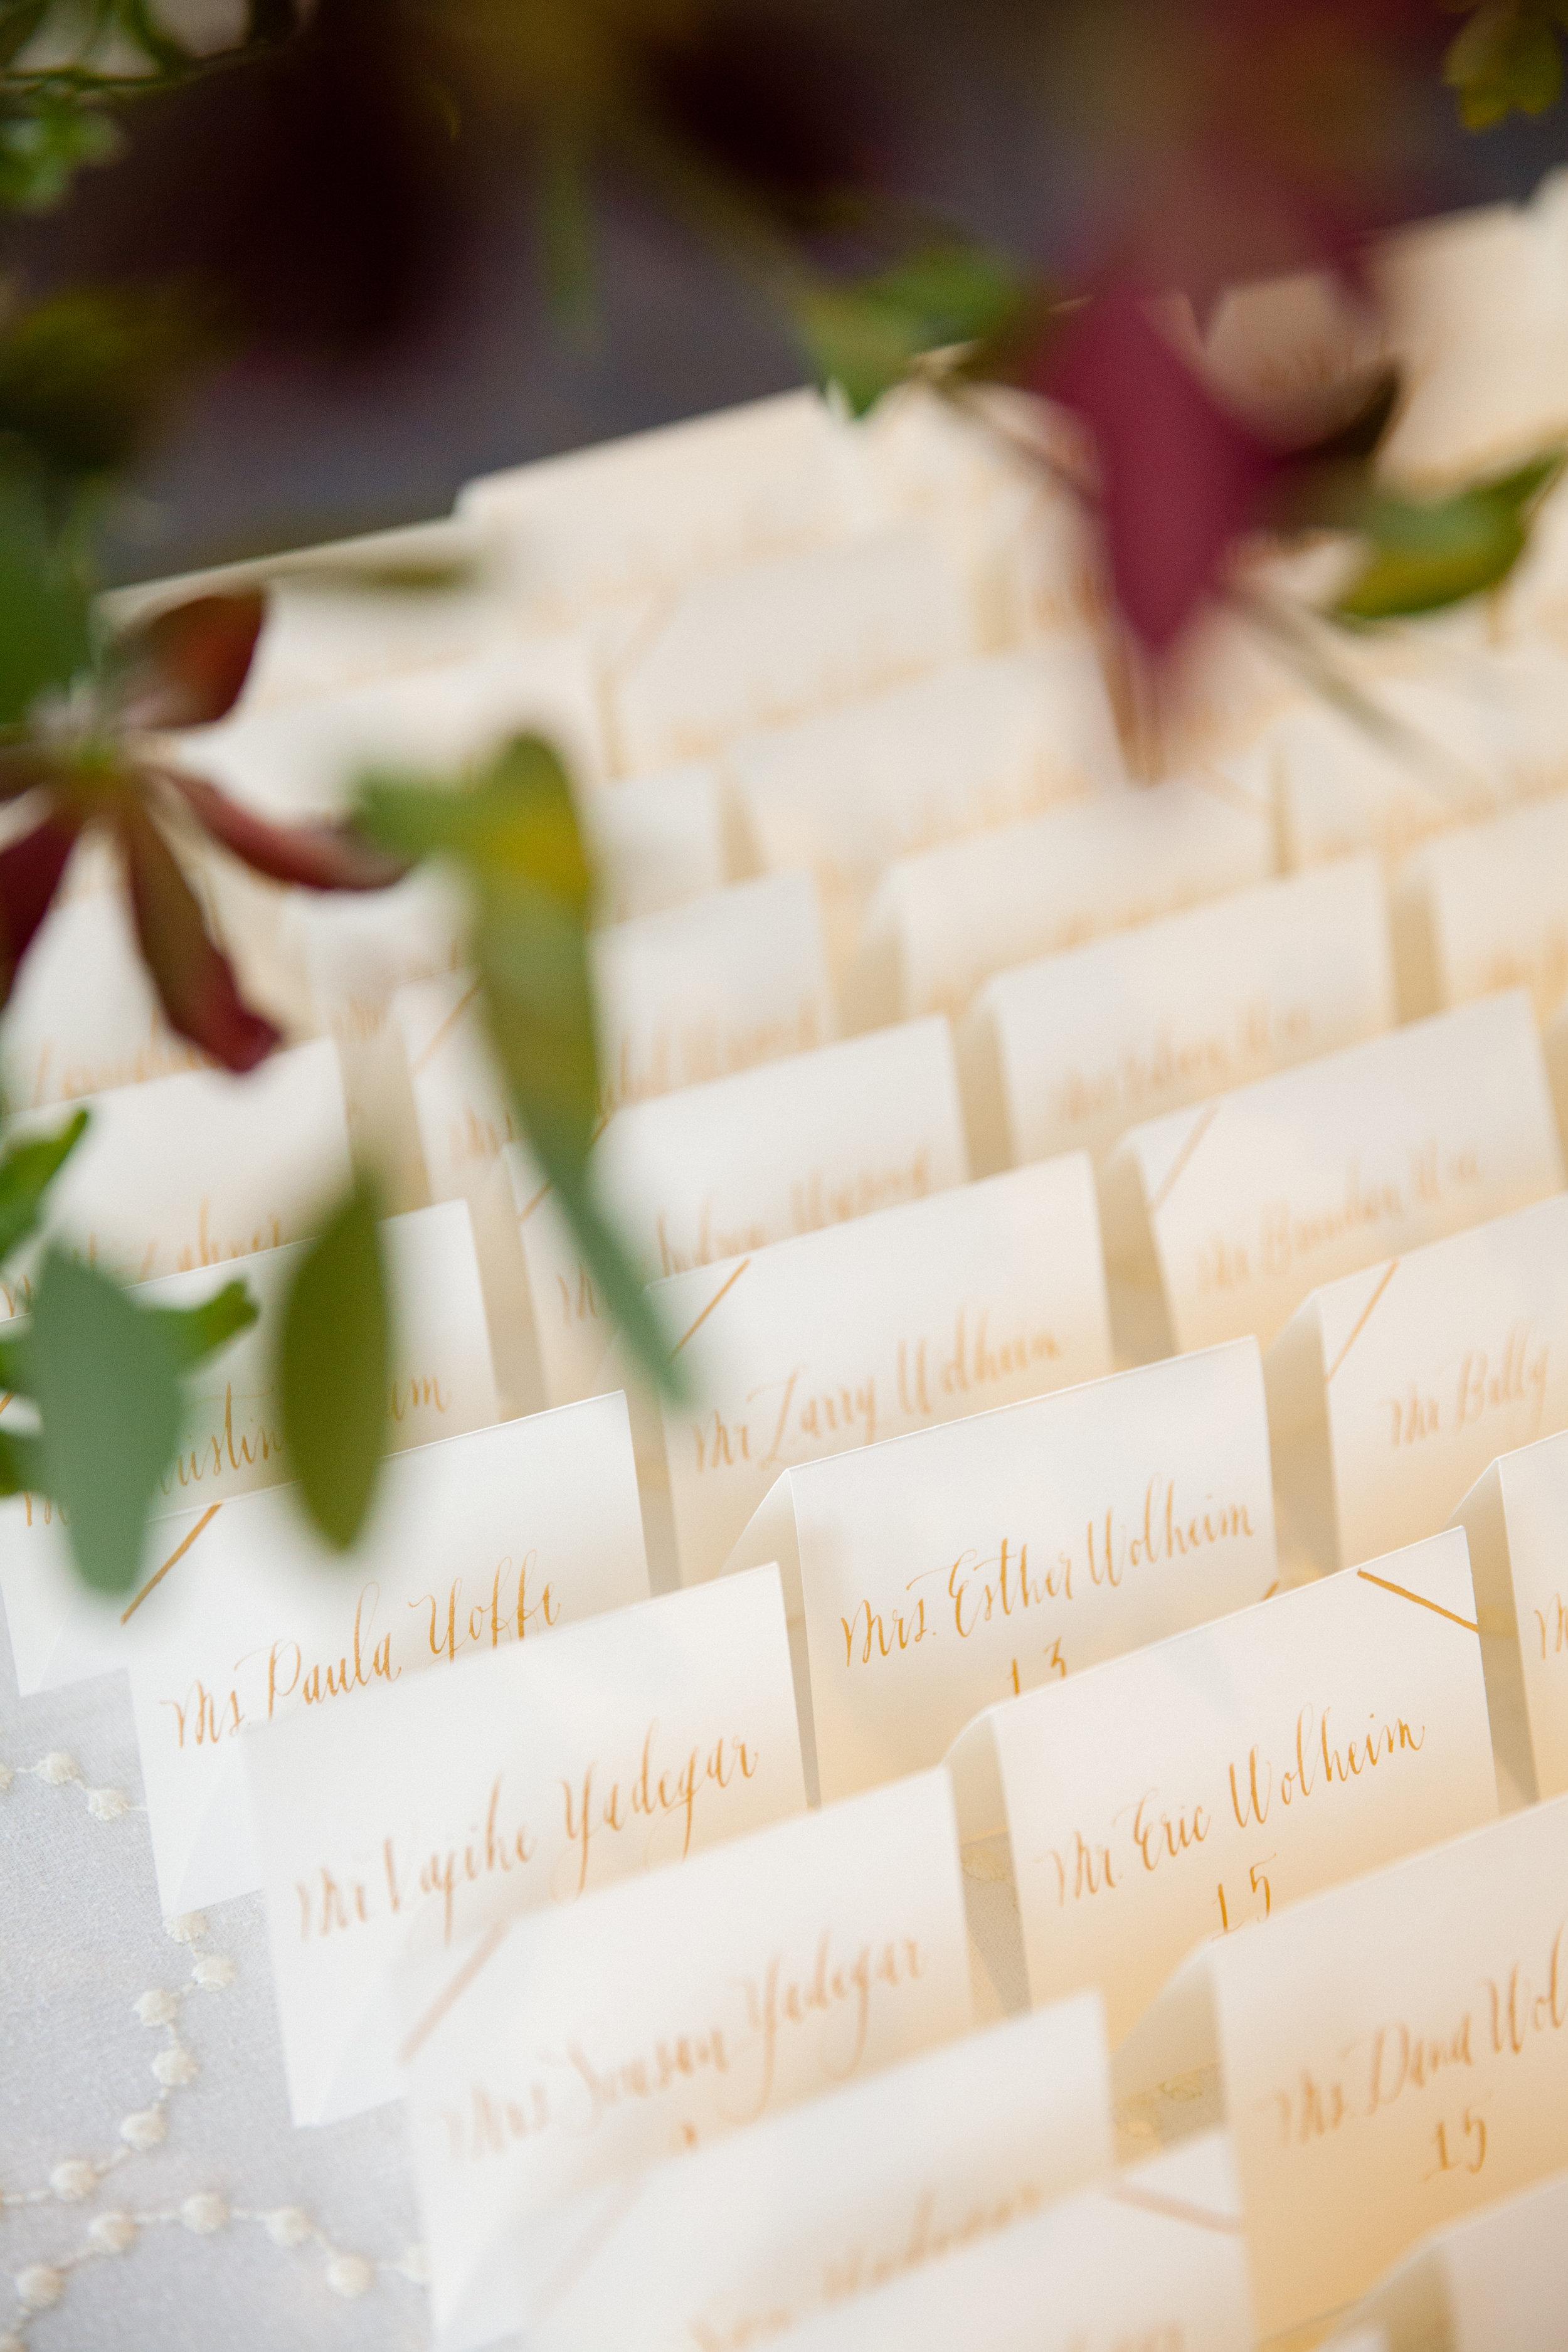 larissa-cleveland-sivanjeremy-wedding-0903.jpg